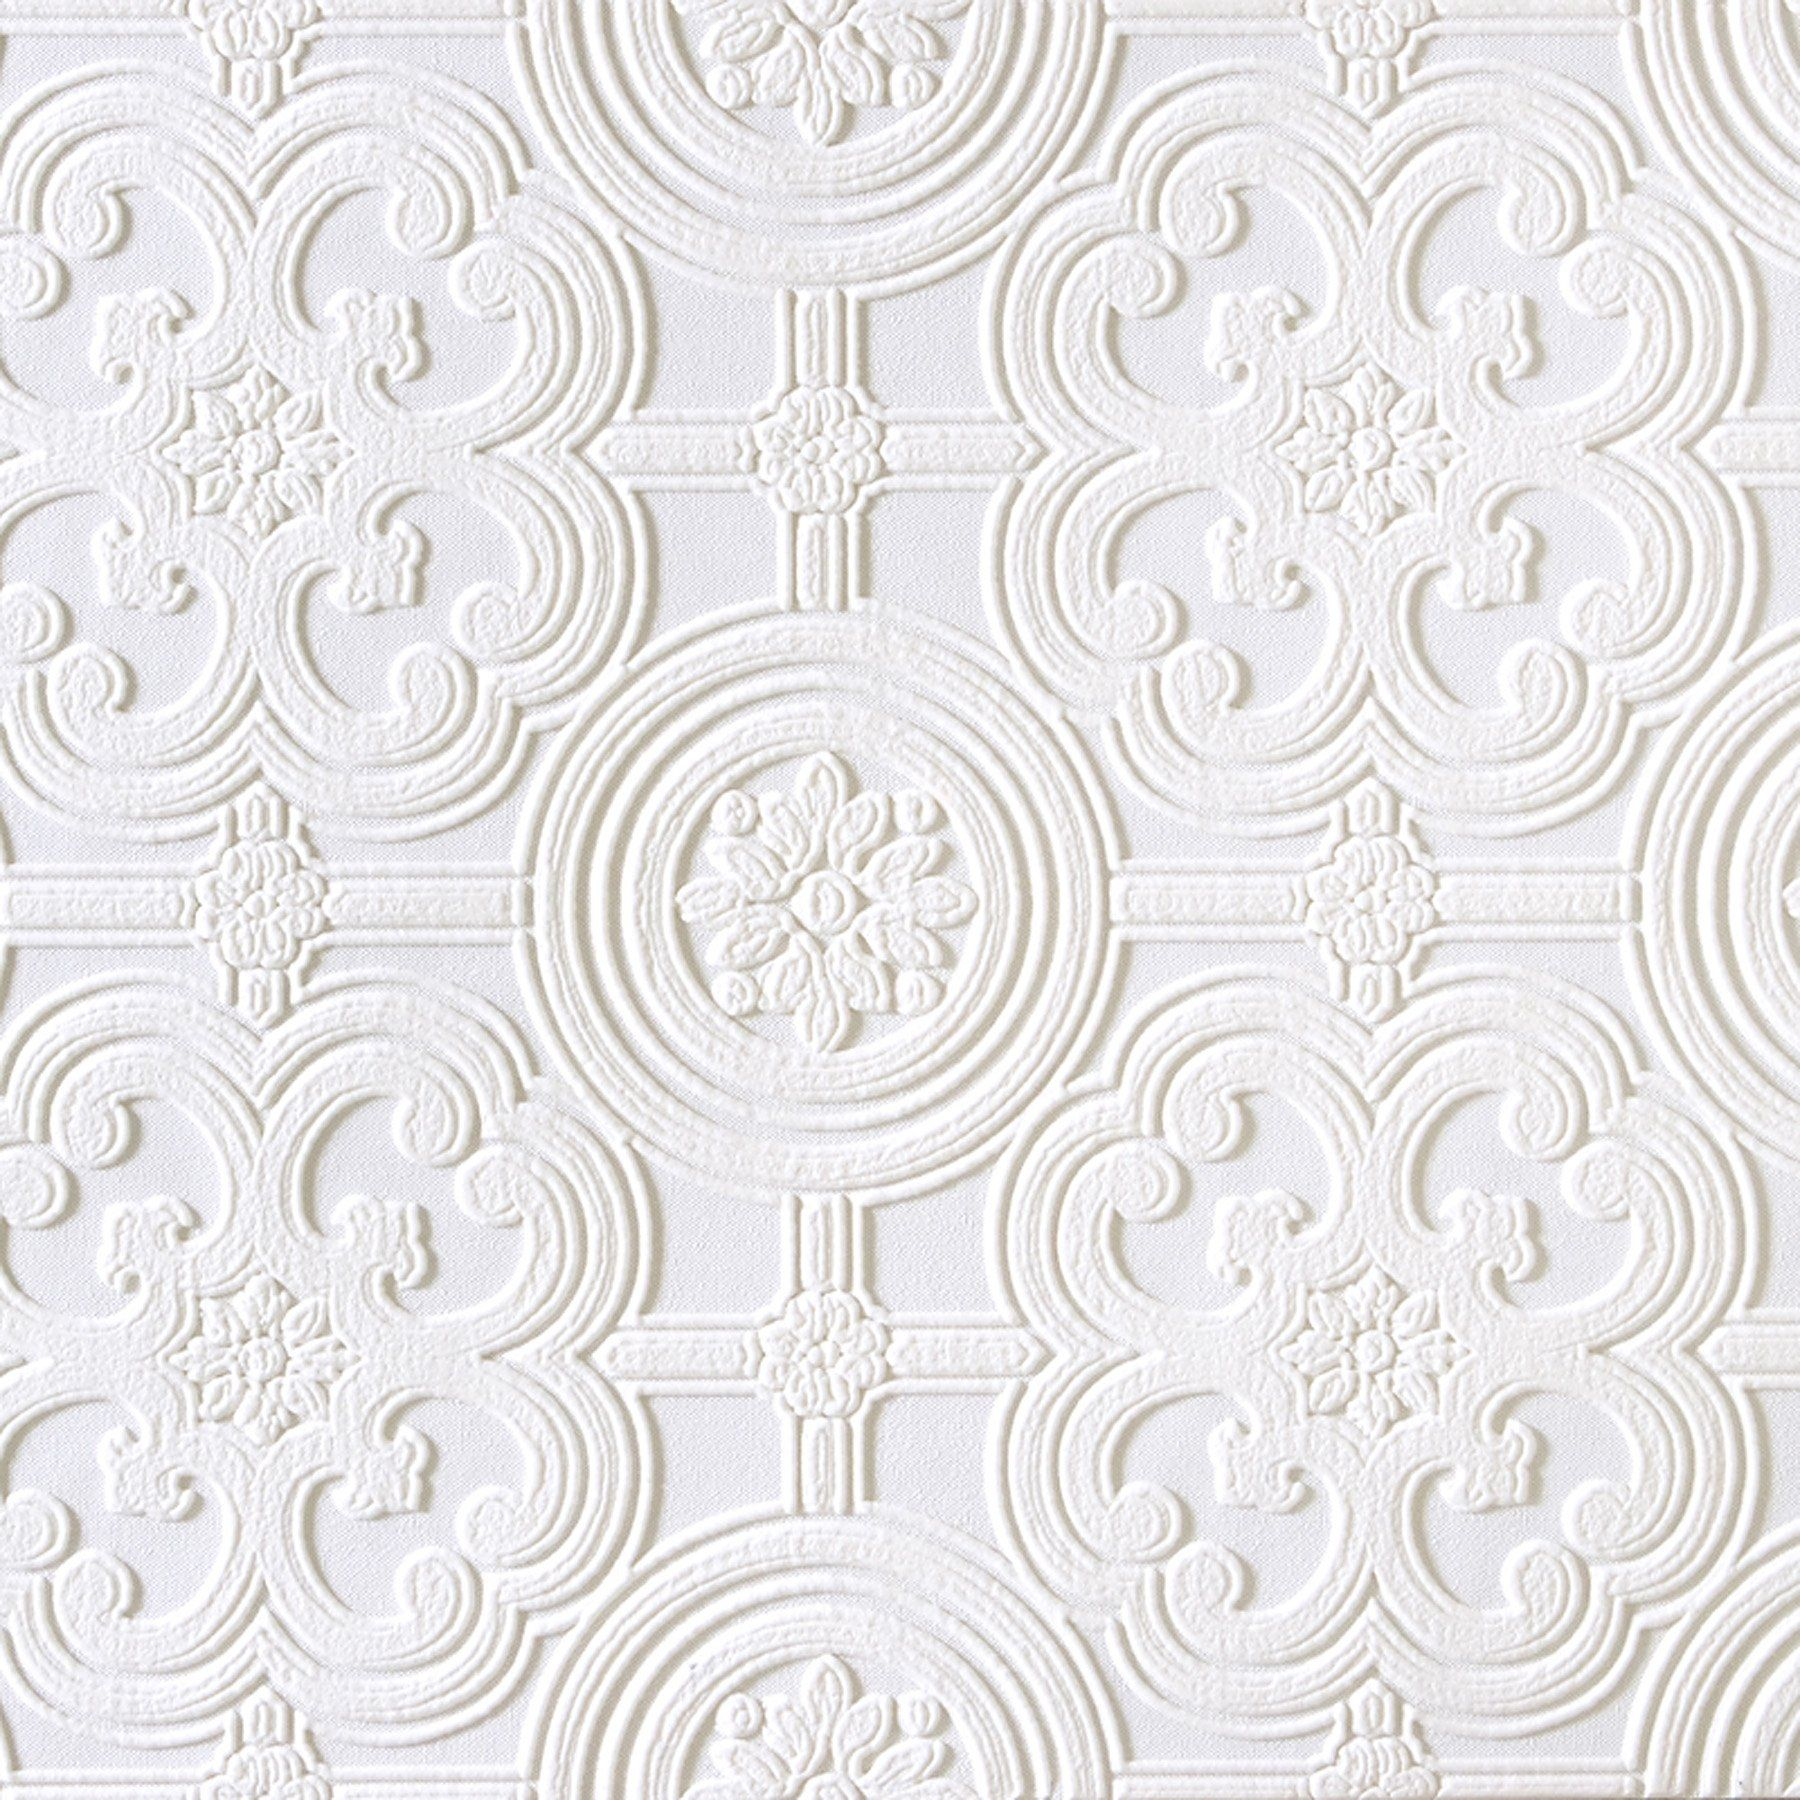 Brewster RD80029 Anaglypta Wallpaper, 21Inch x 396Inch